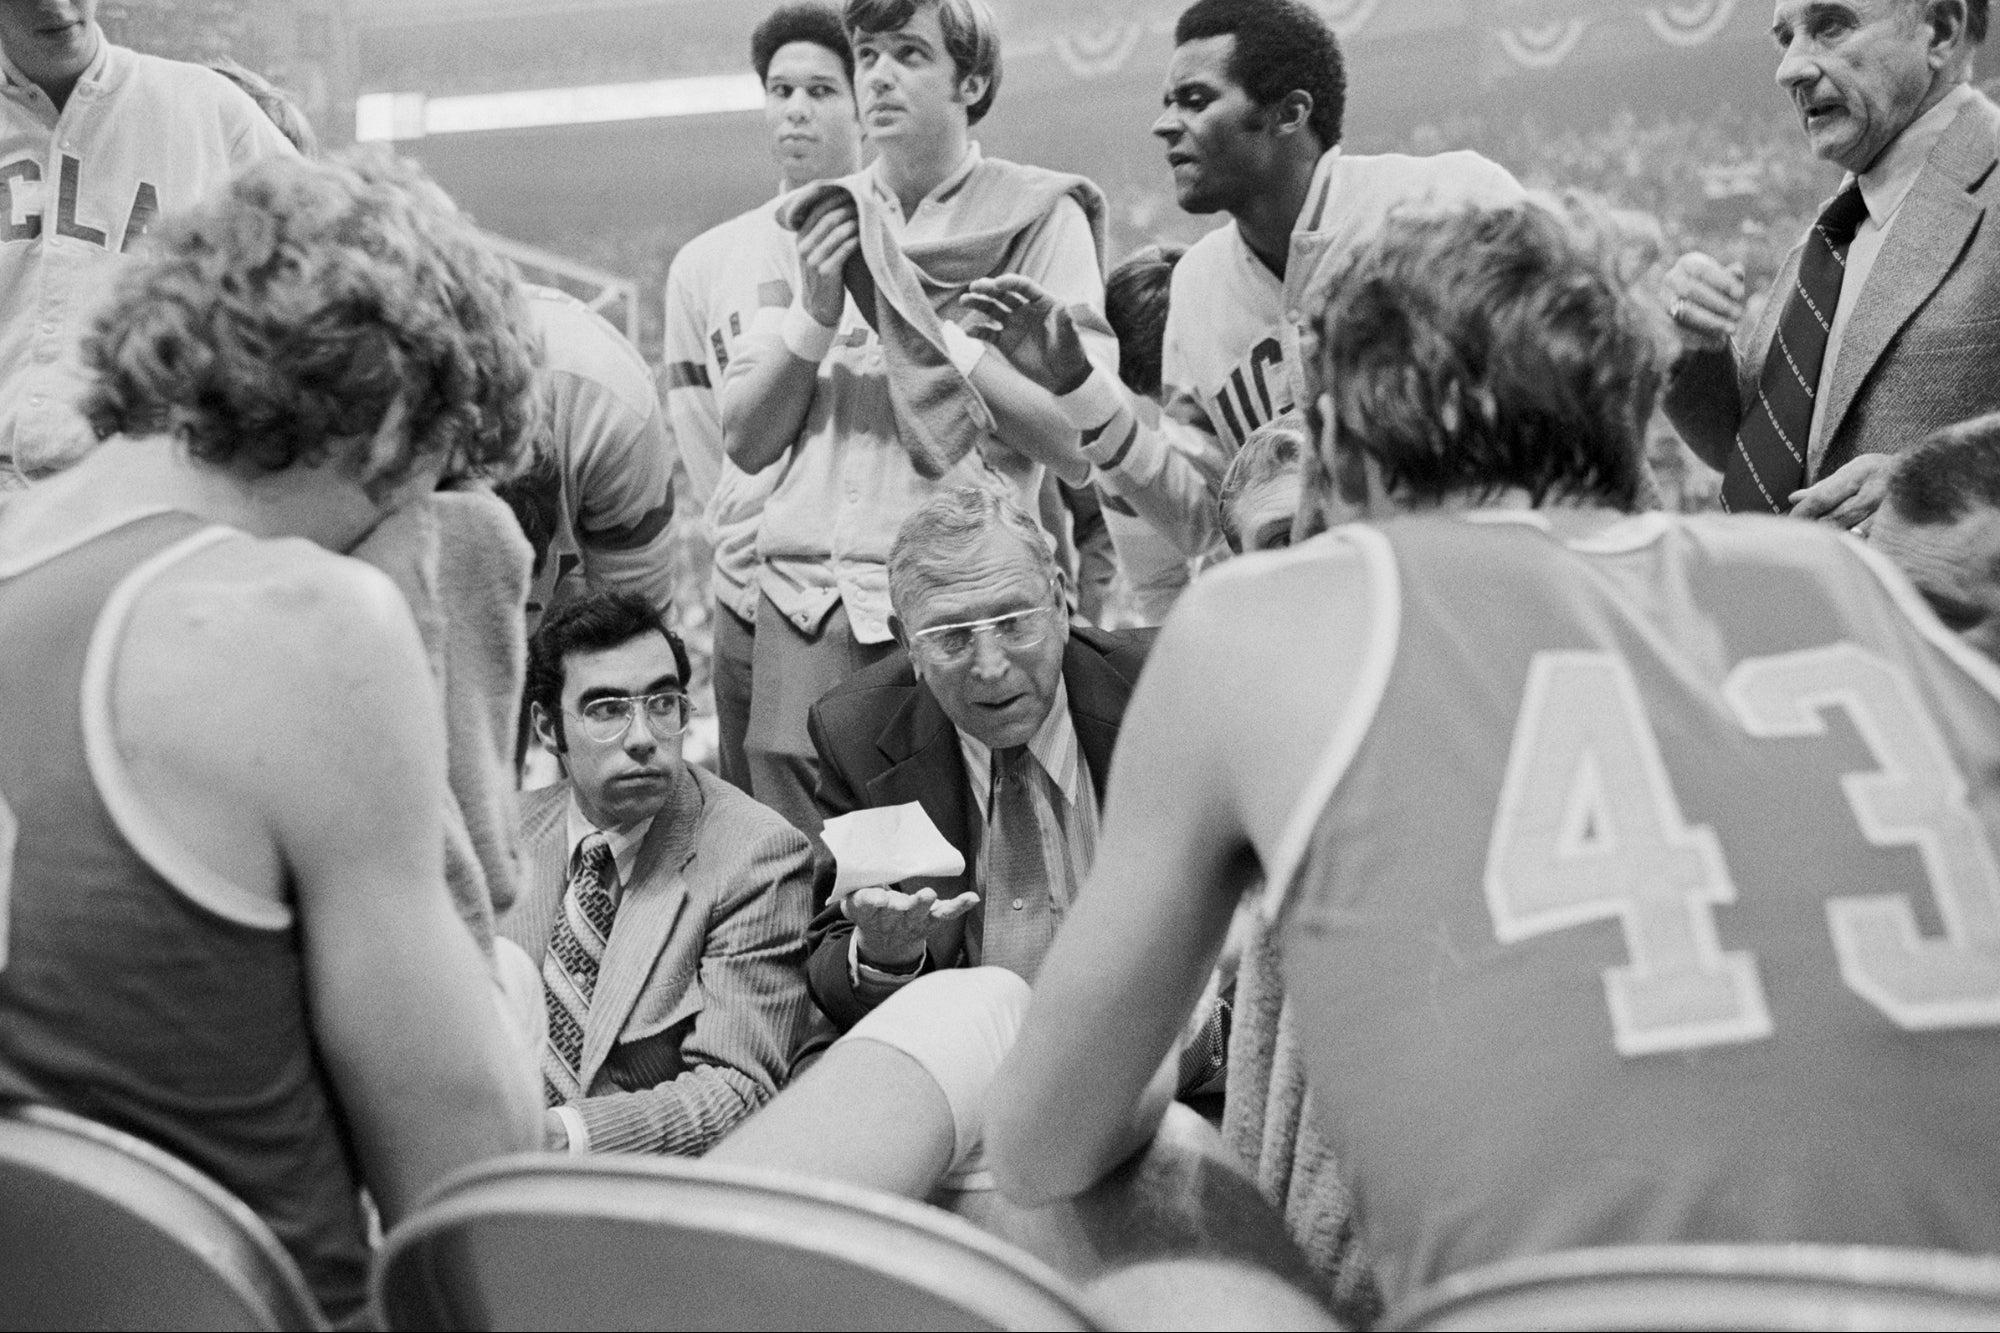 Coach John Wooden's 6 Ways to Rethink Change